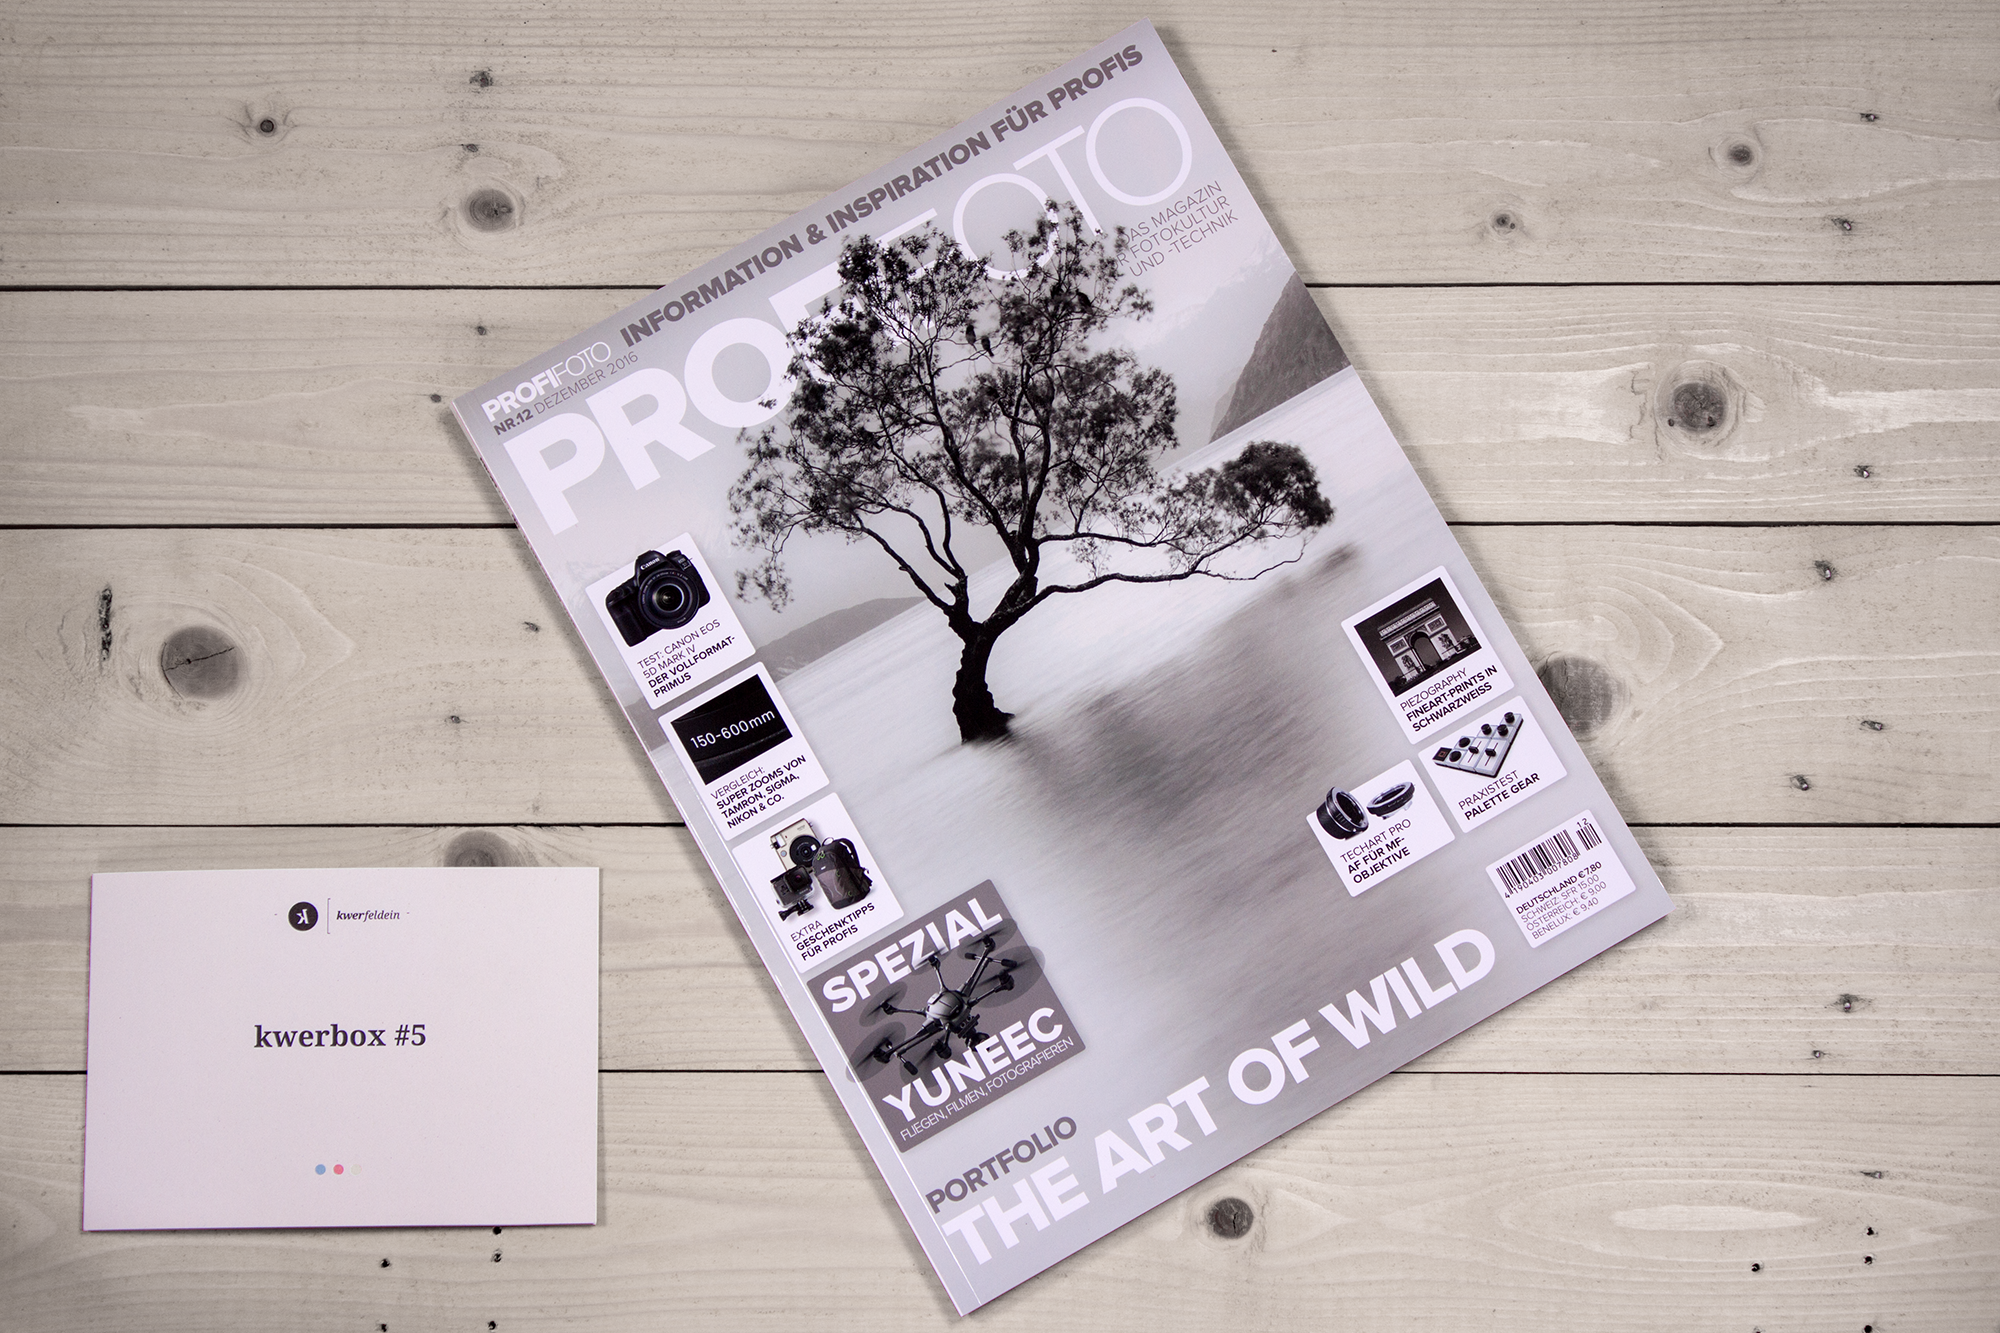 Kwerbox Nr.5 Unboxing Profifoto Magazin